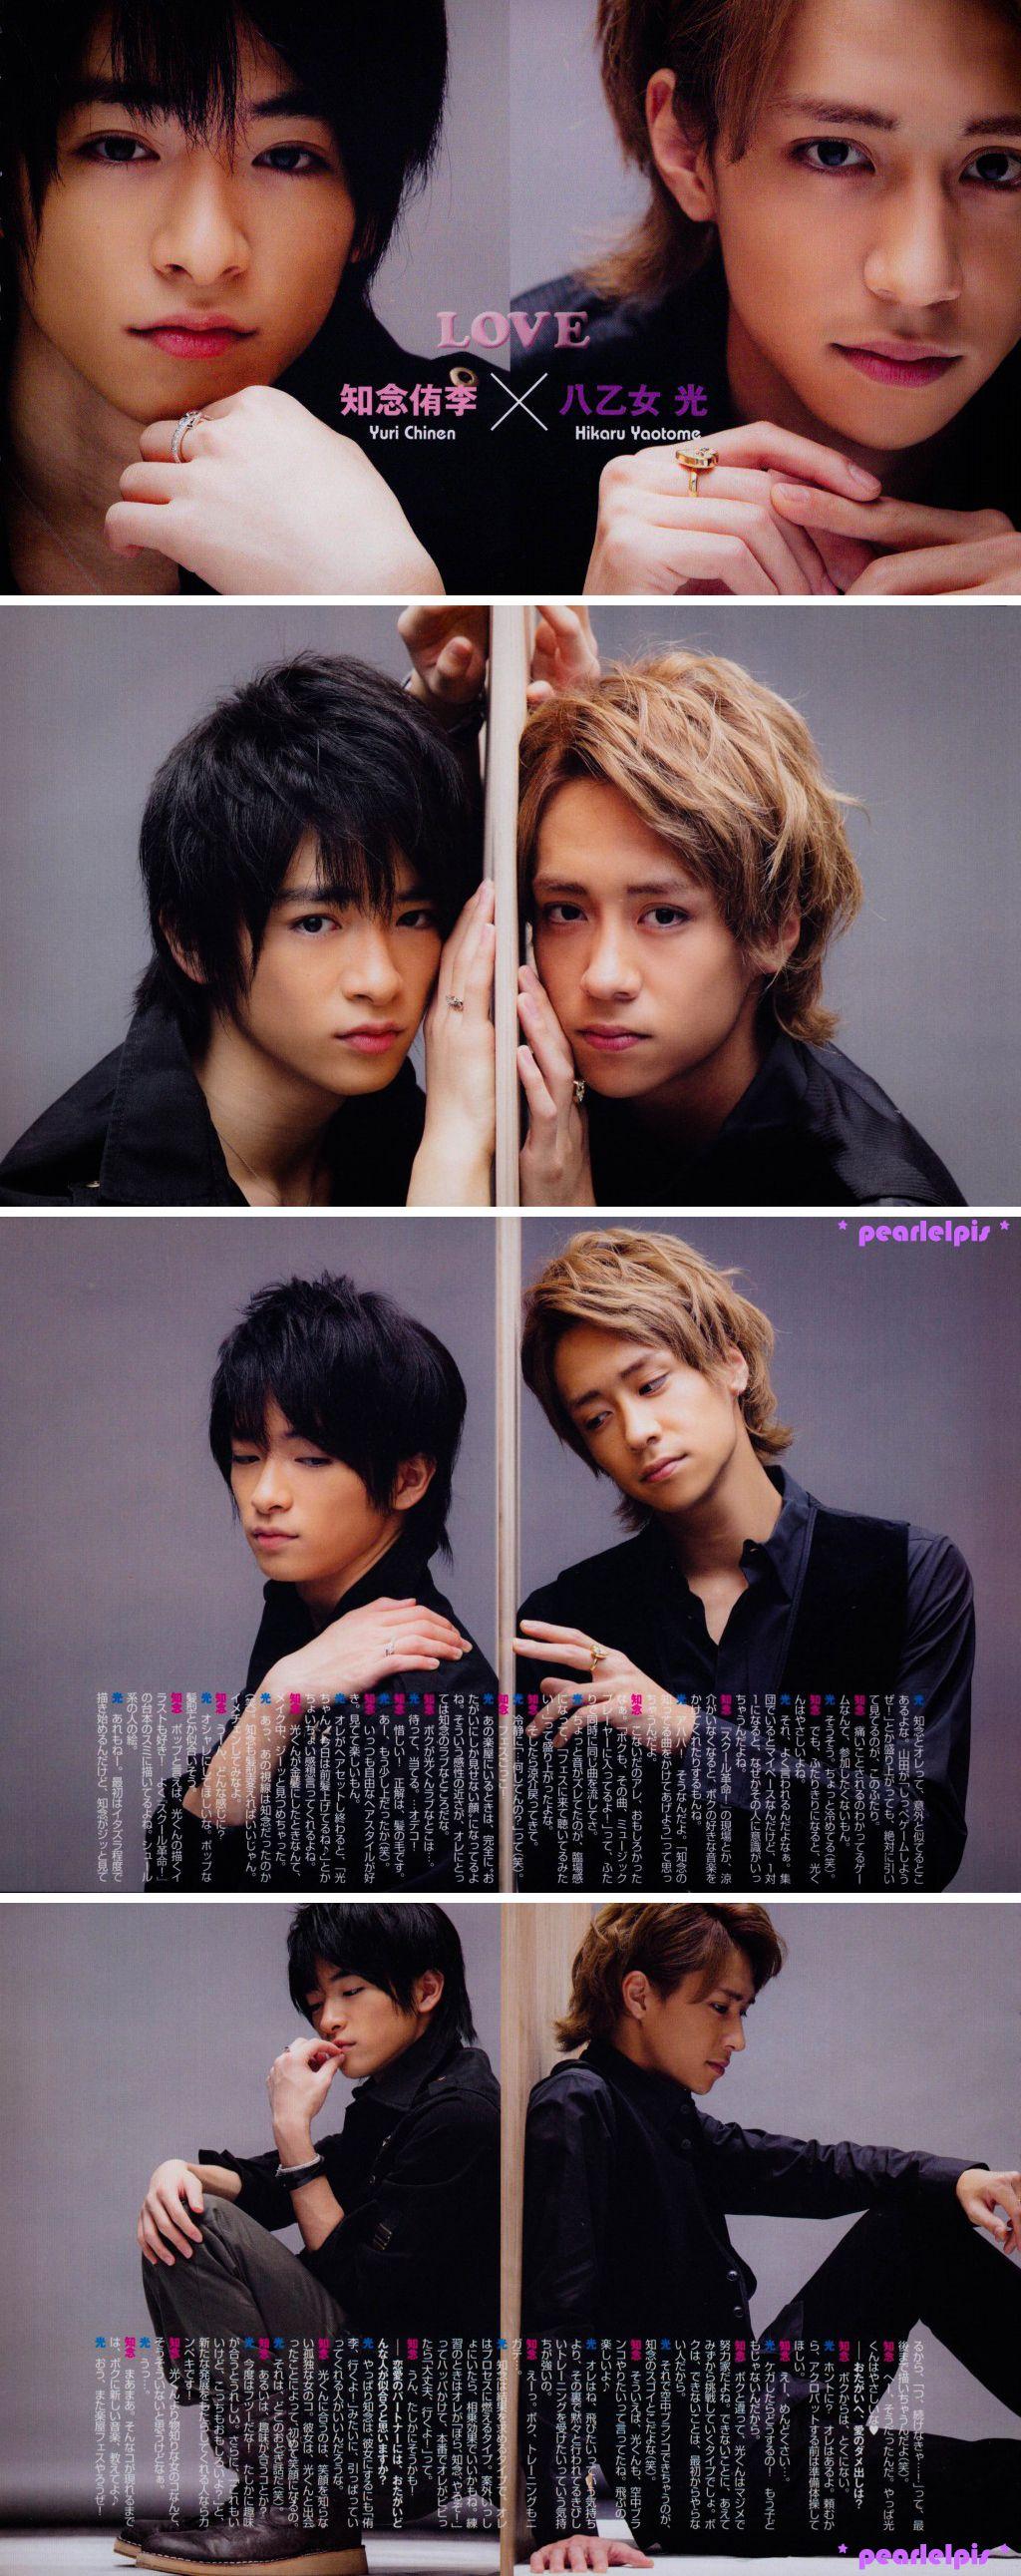 yuri chinen amp hikaru yaotome hey say jump 201203 duet